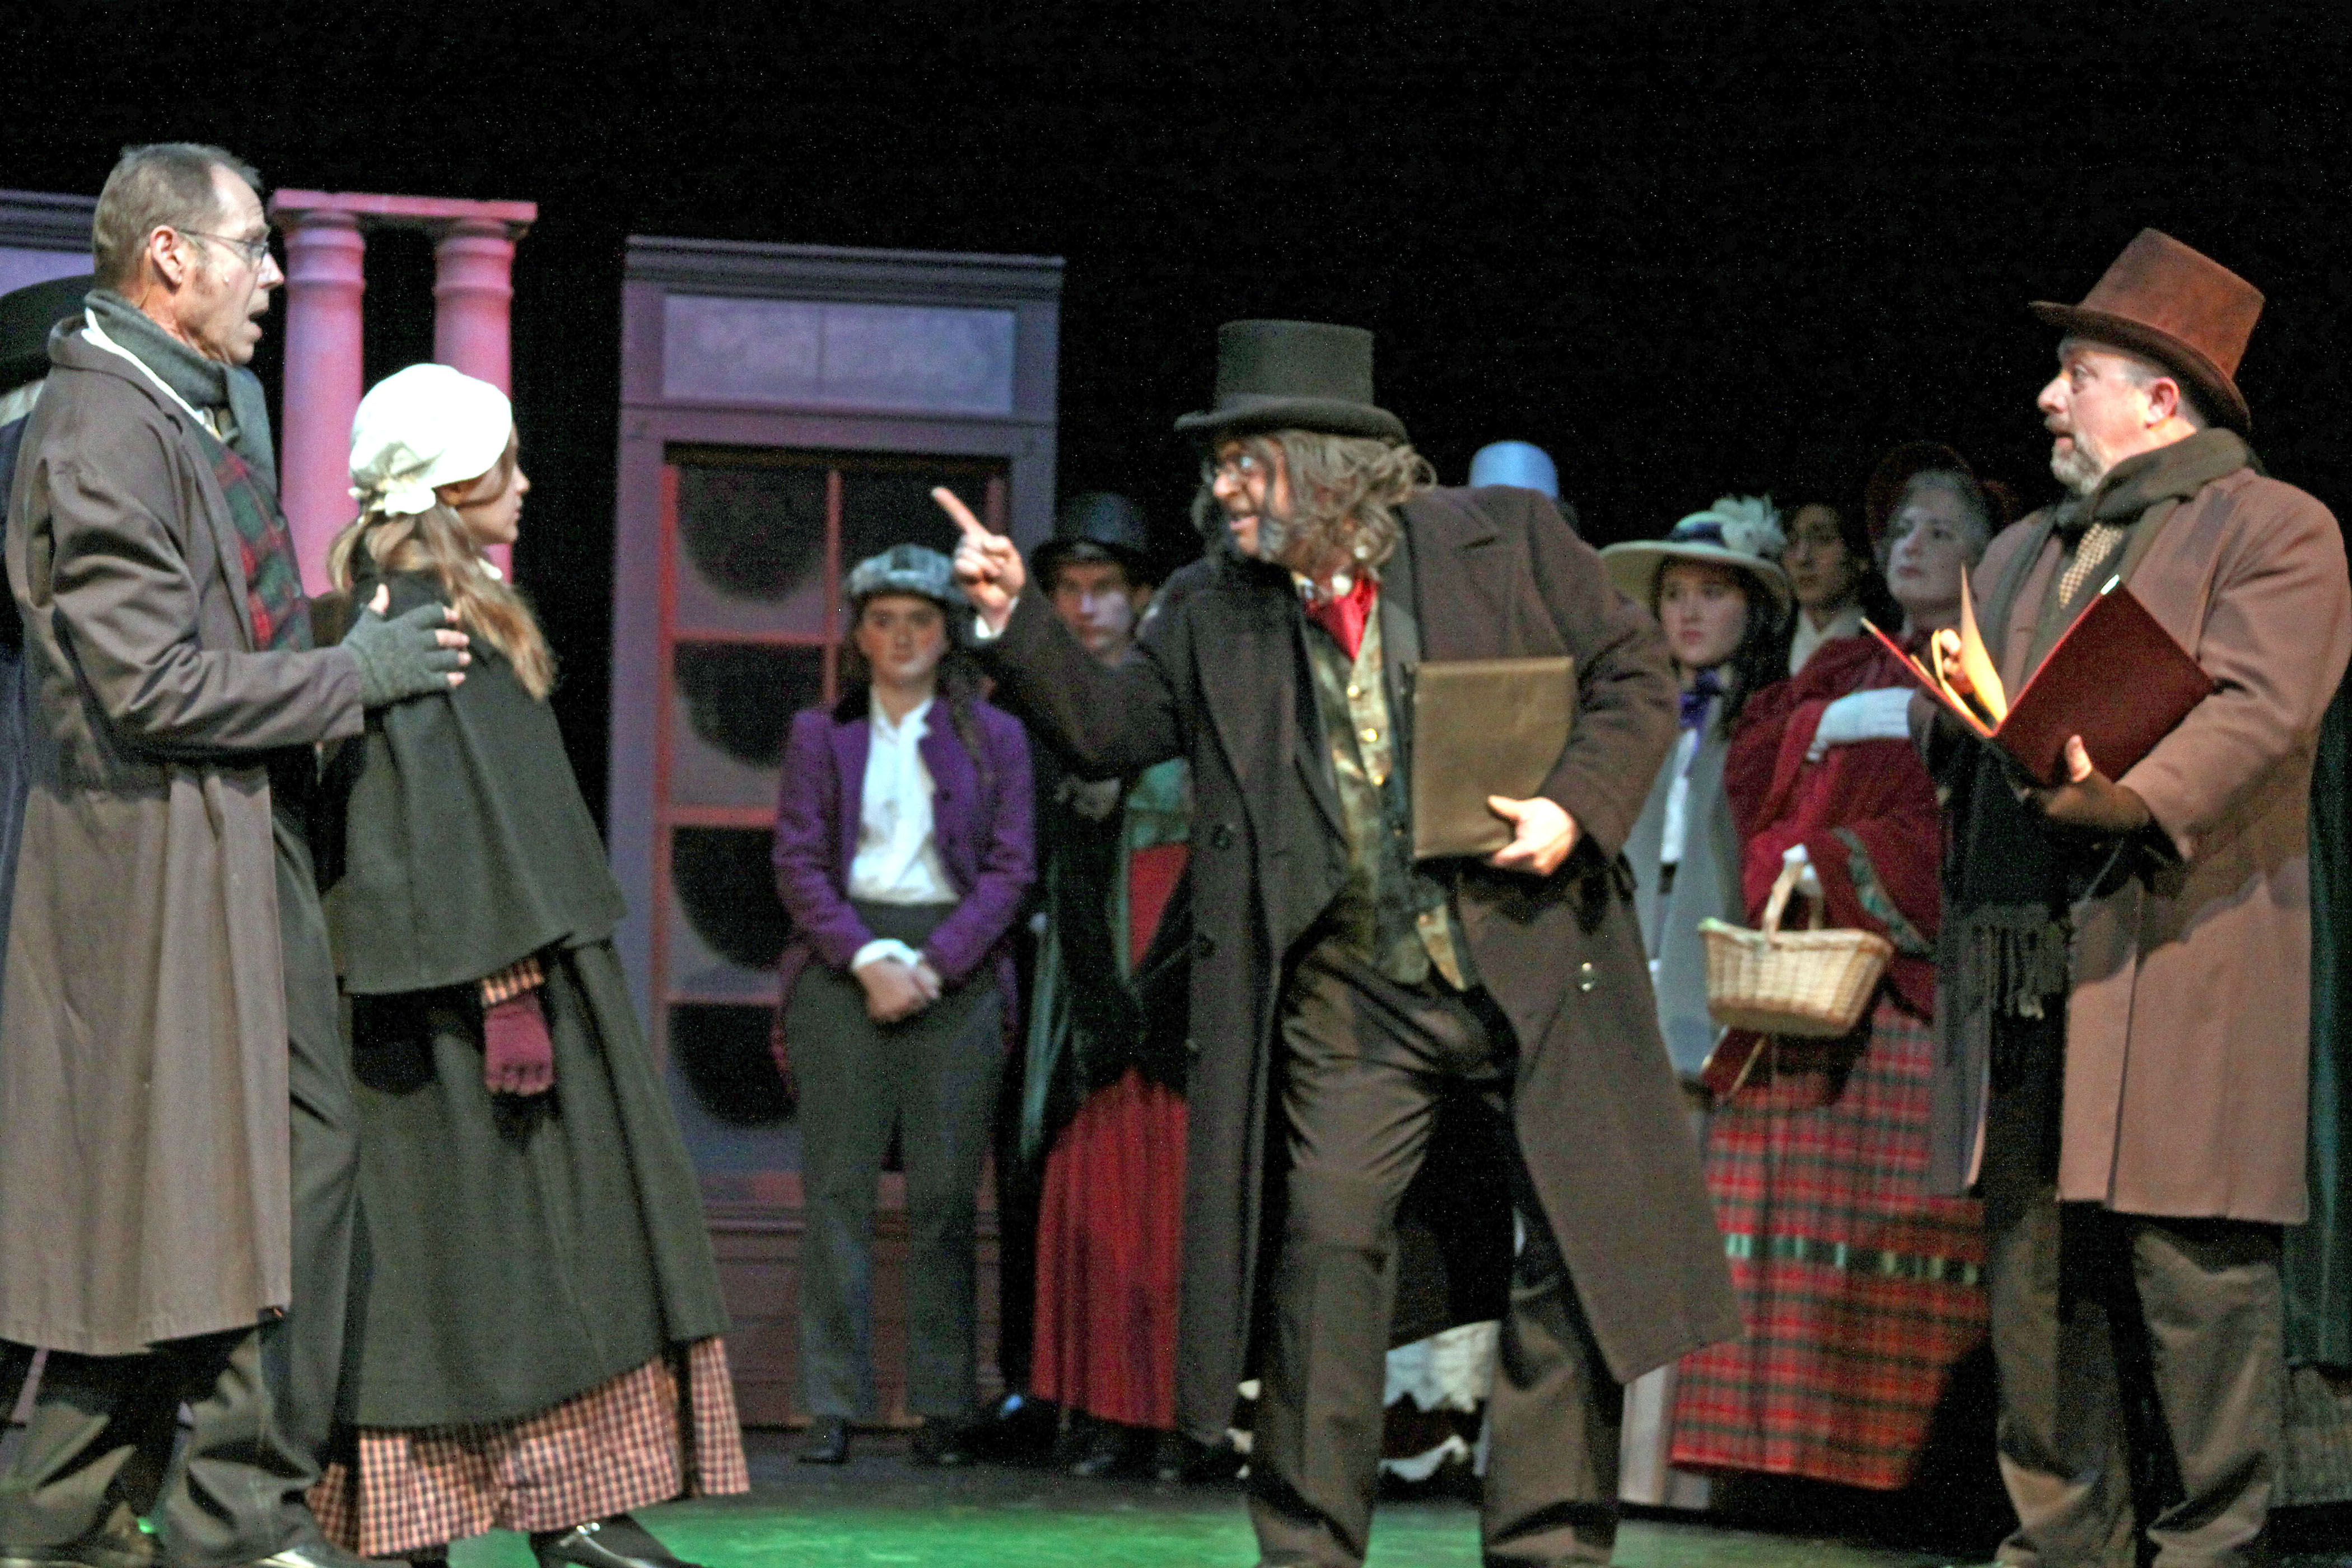 G Scrooge reprimandg debtor